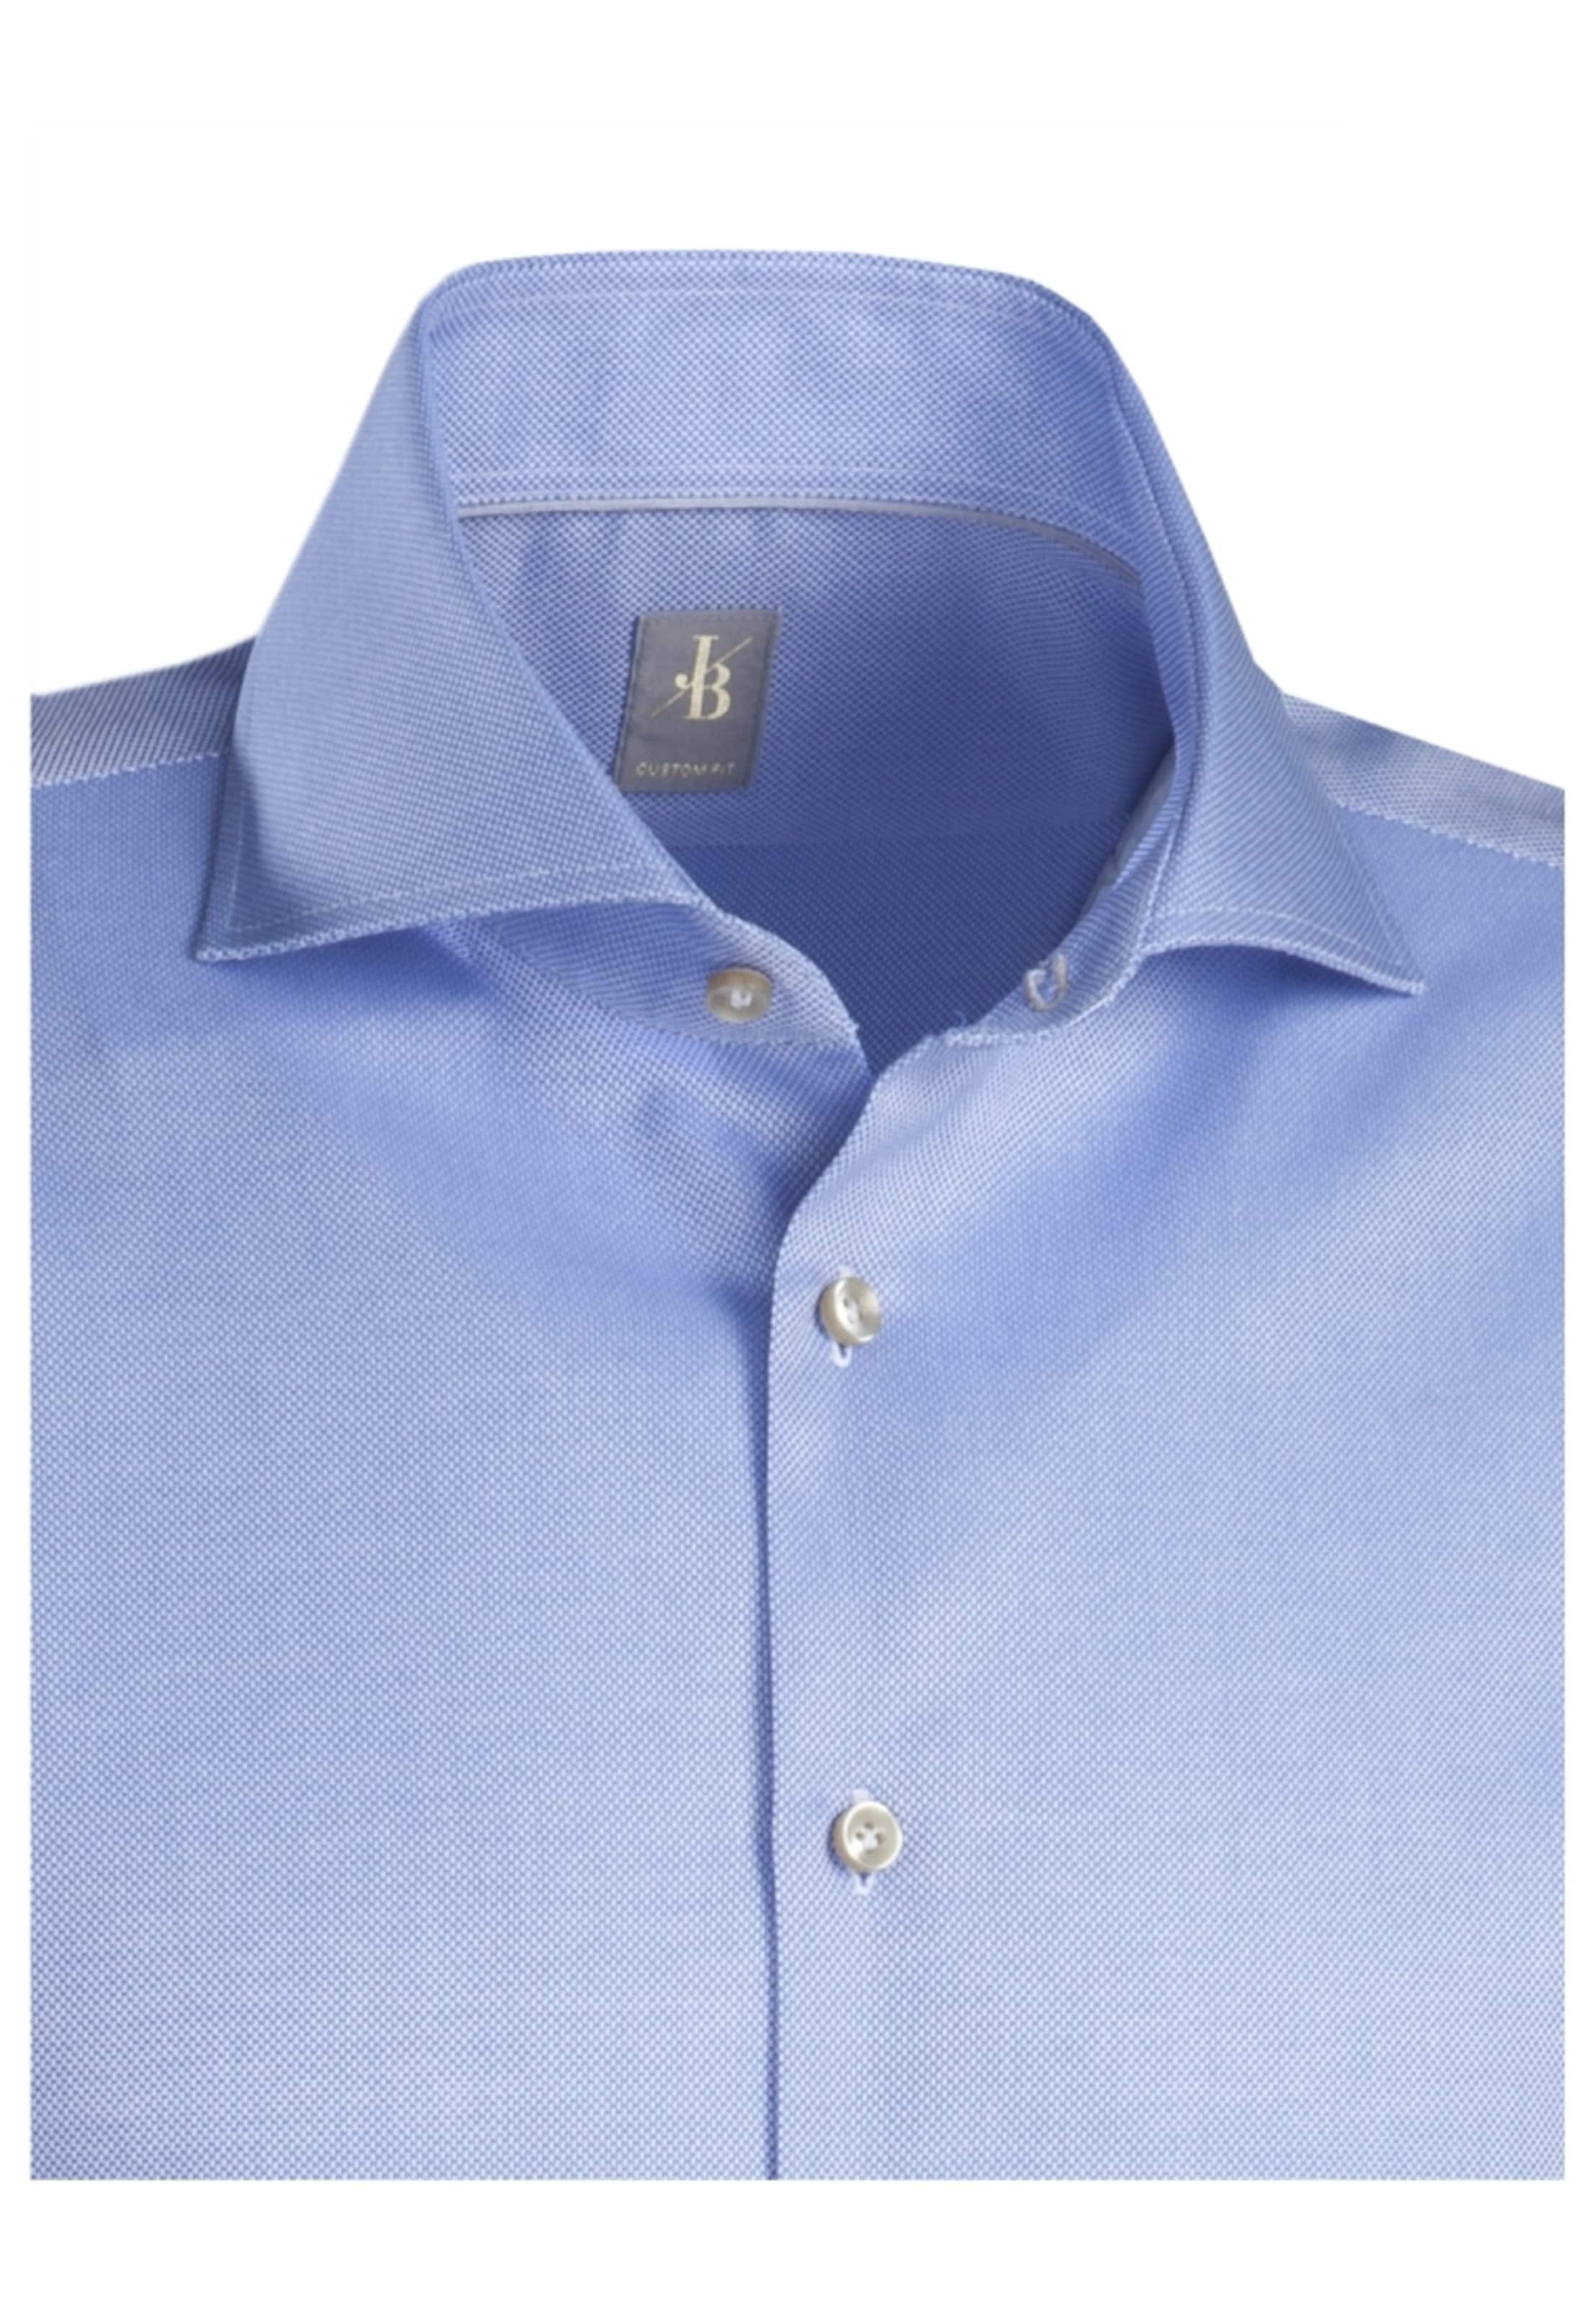 hemd Fit Custom Britt In City Royalblau Jacques ' wZTPilOkXu